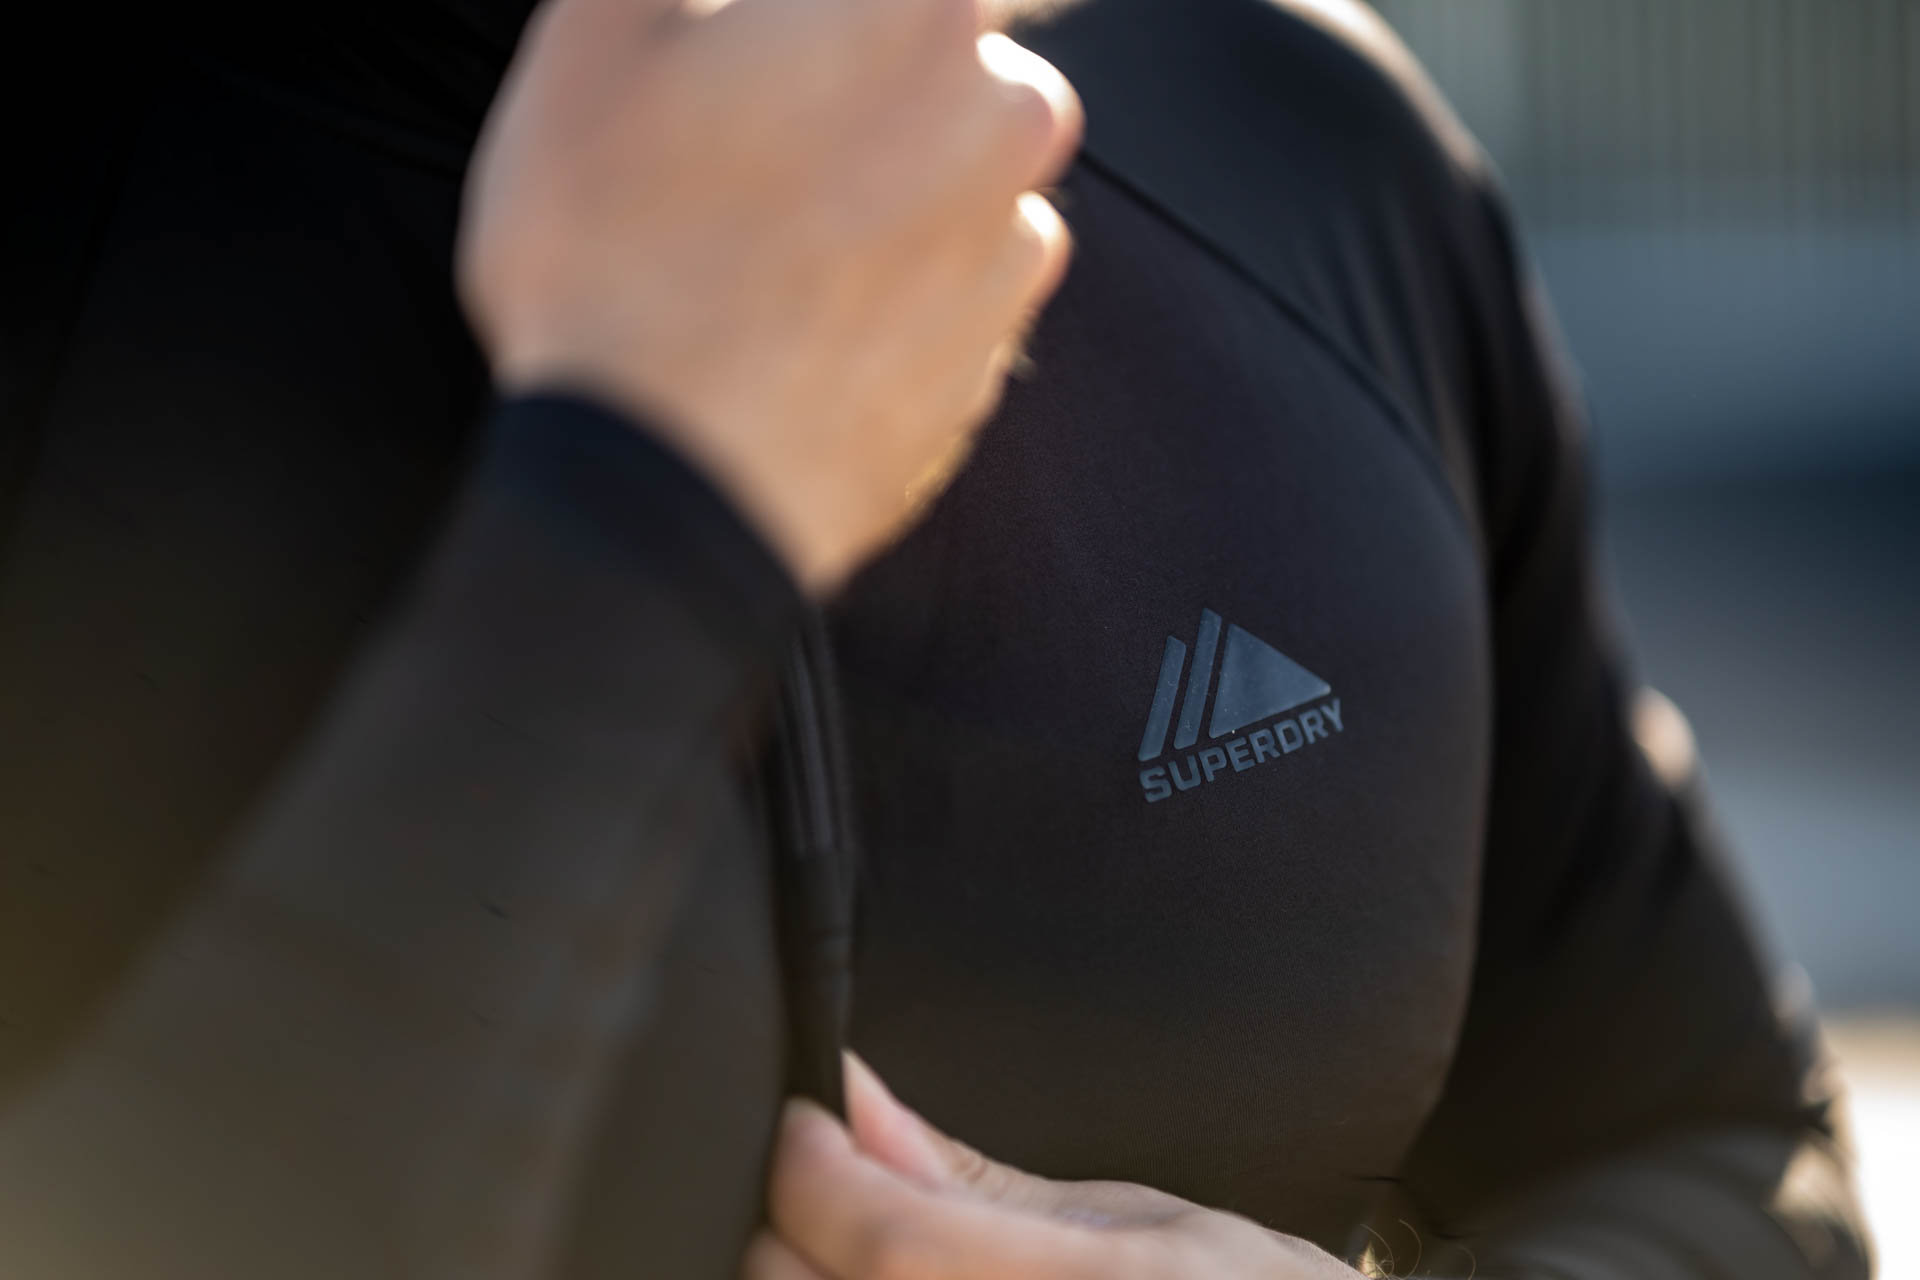 Køb Superdry hos Kaiser Sport & Ortopædi, KSO